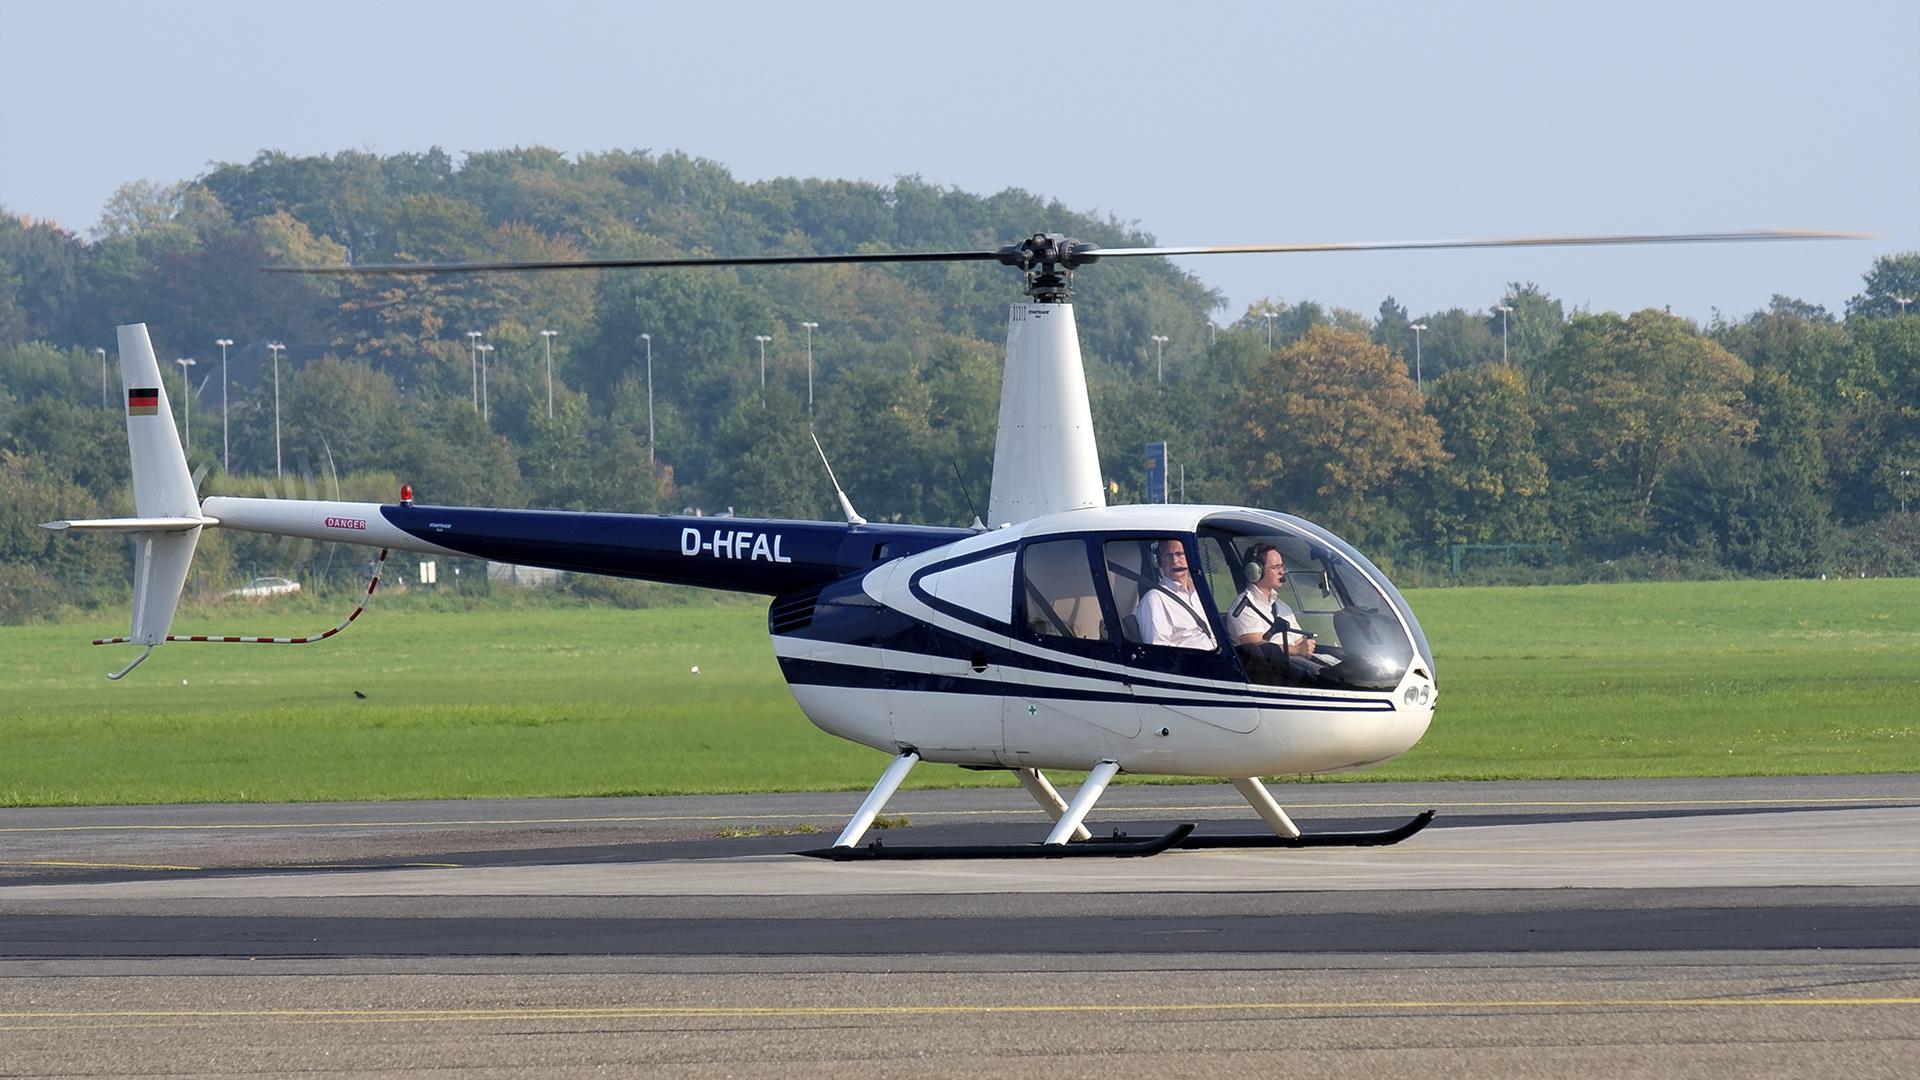 D-HFAL-1 R44  ESS 201709